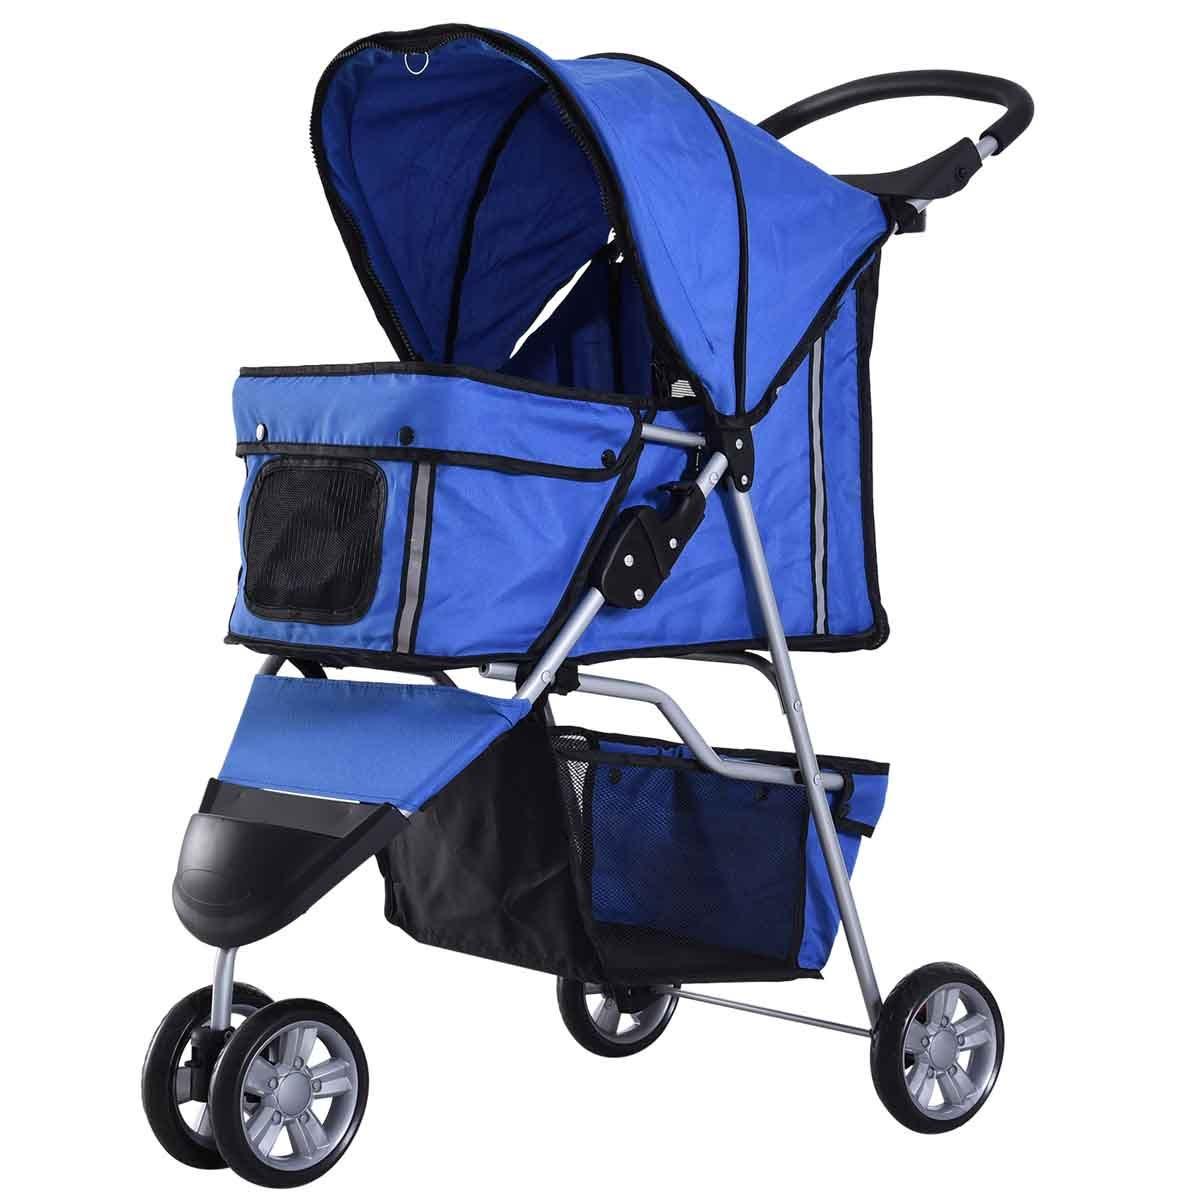 PawHut 3 Wheel Pet Stroller Pram - Blue